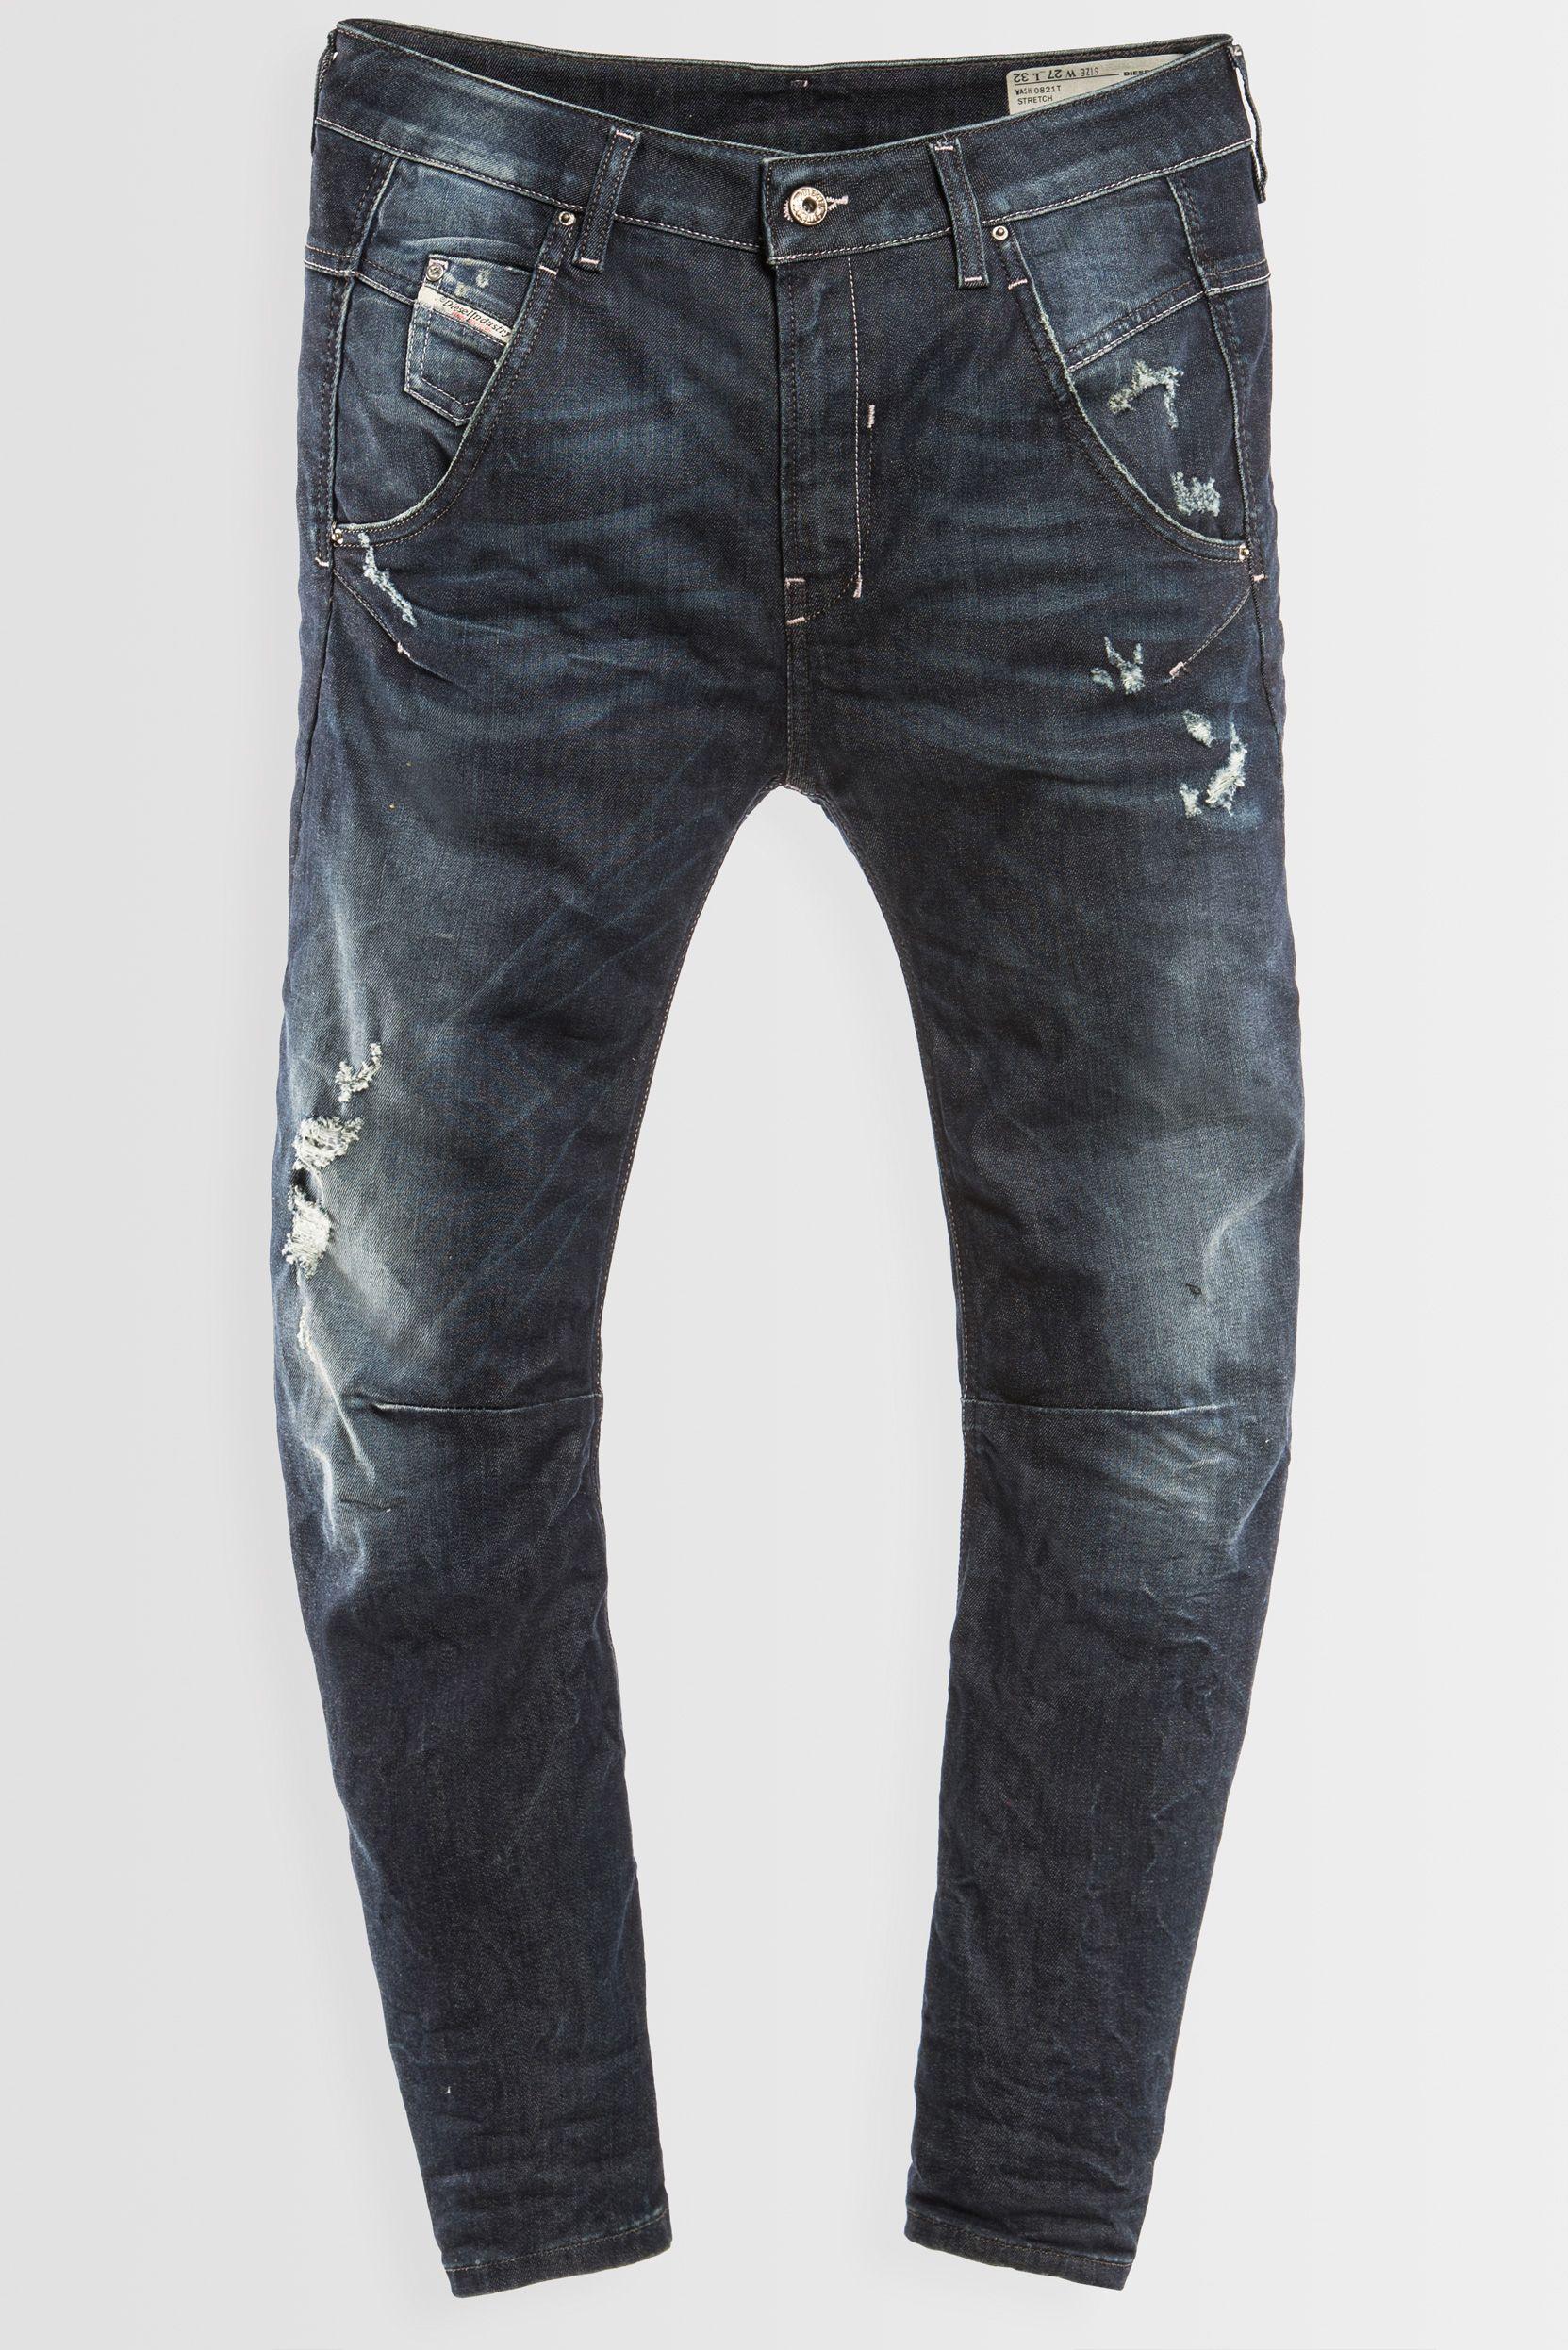 43f82a05 Diesel #jeans: FAYZA 0821T #DNA #Indigo | denim forever in 2019 ...